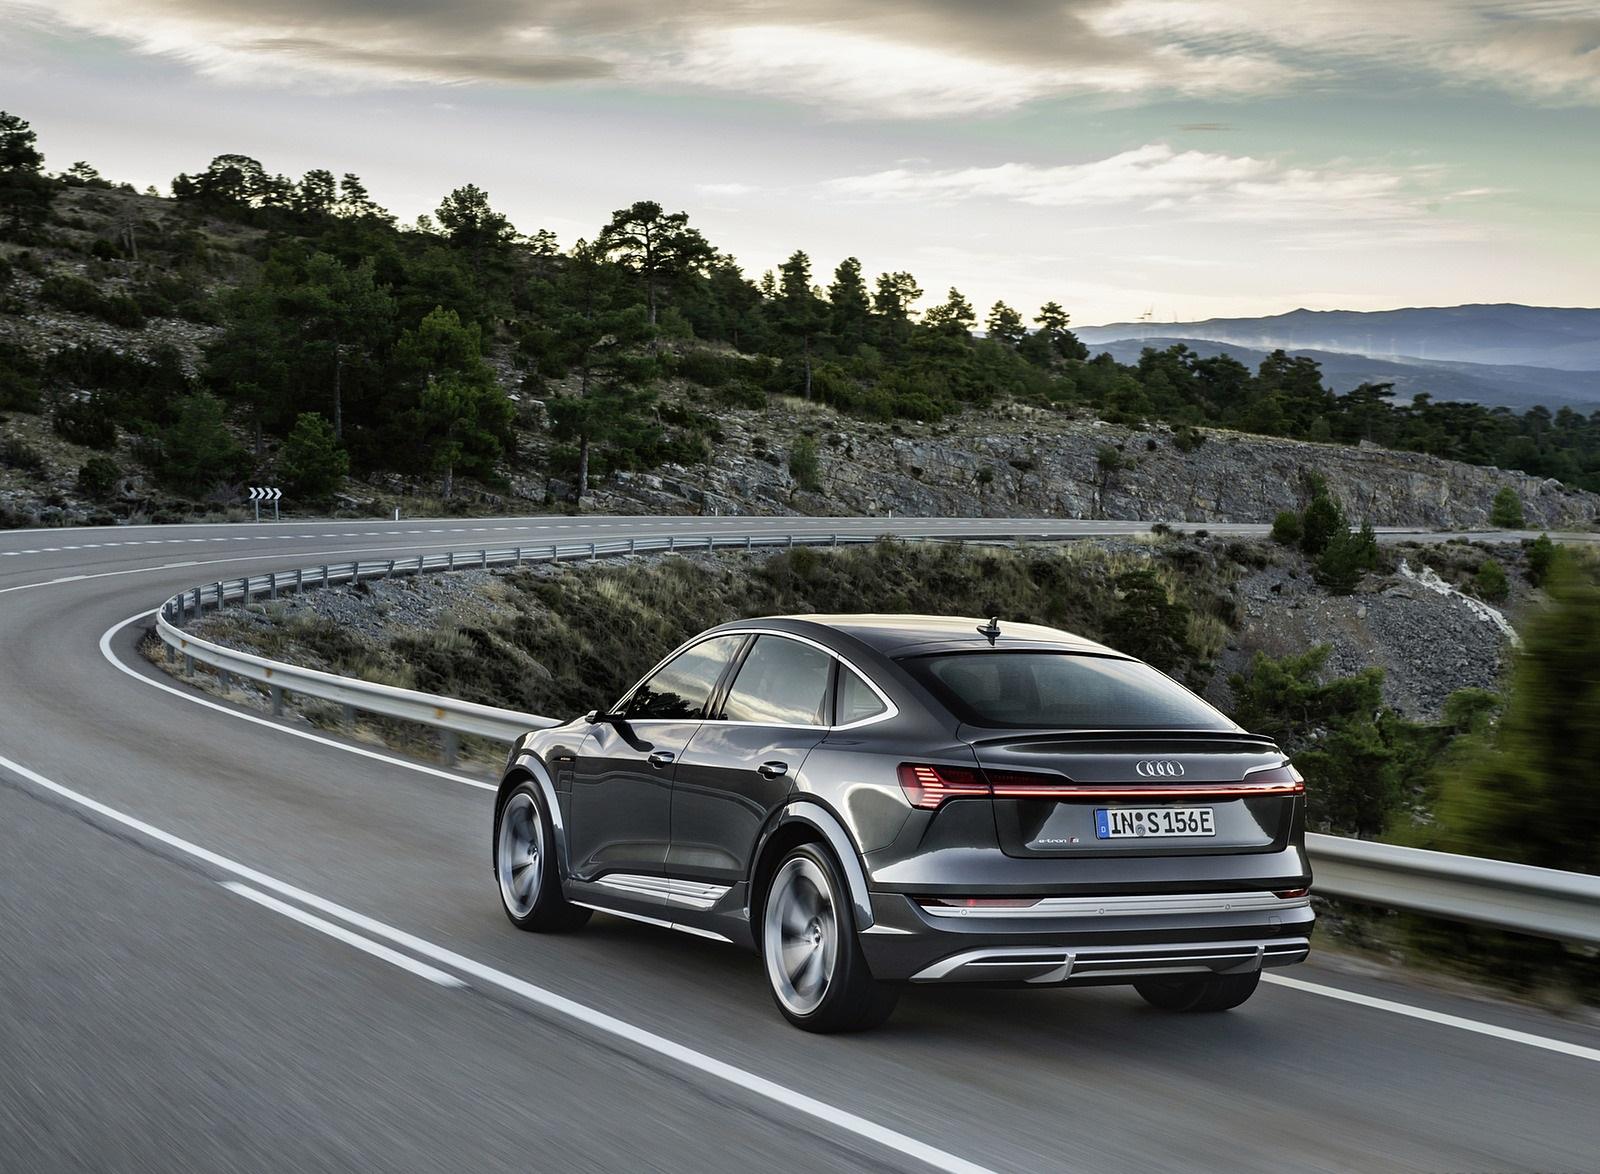 2021 Audi e-tron S Sportback (Color: Daytona Gray) Rear Three-Quarter Wallpapers  (9)